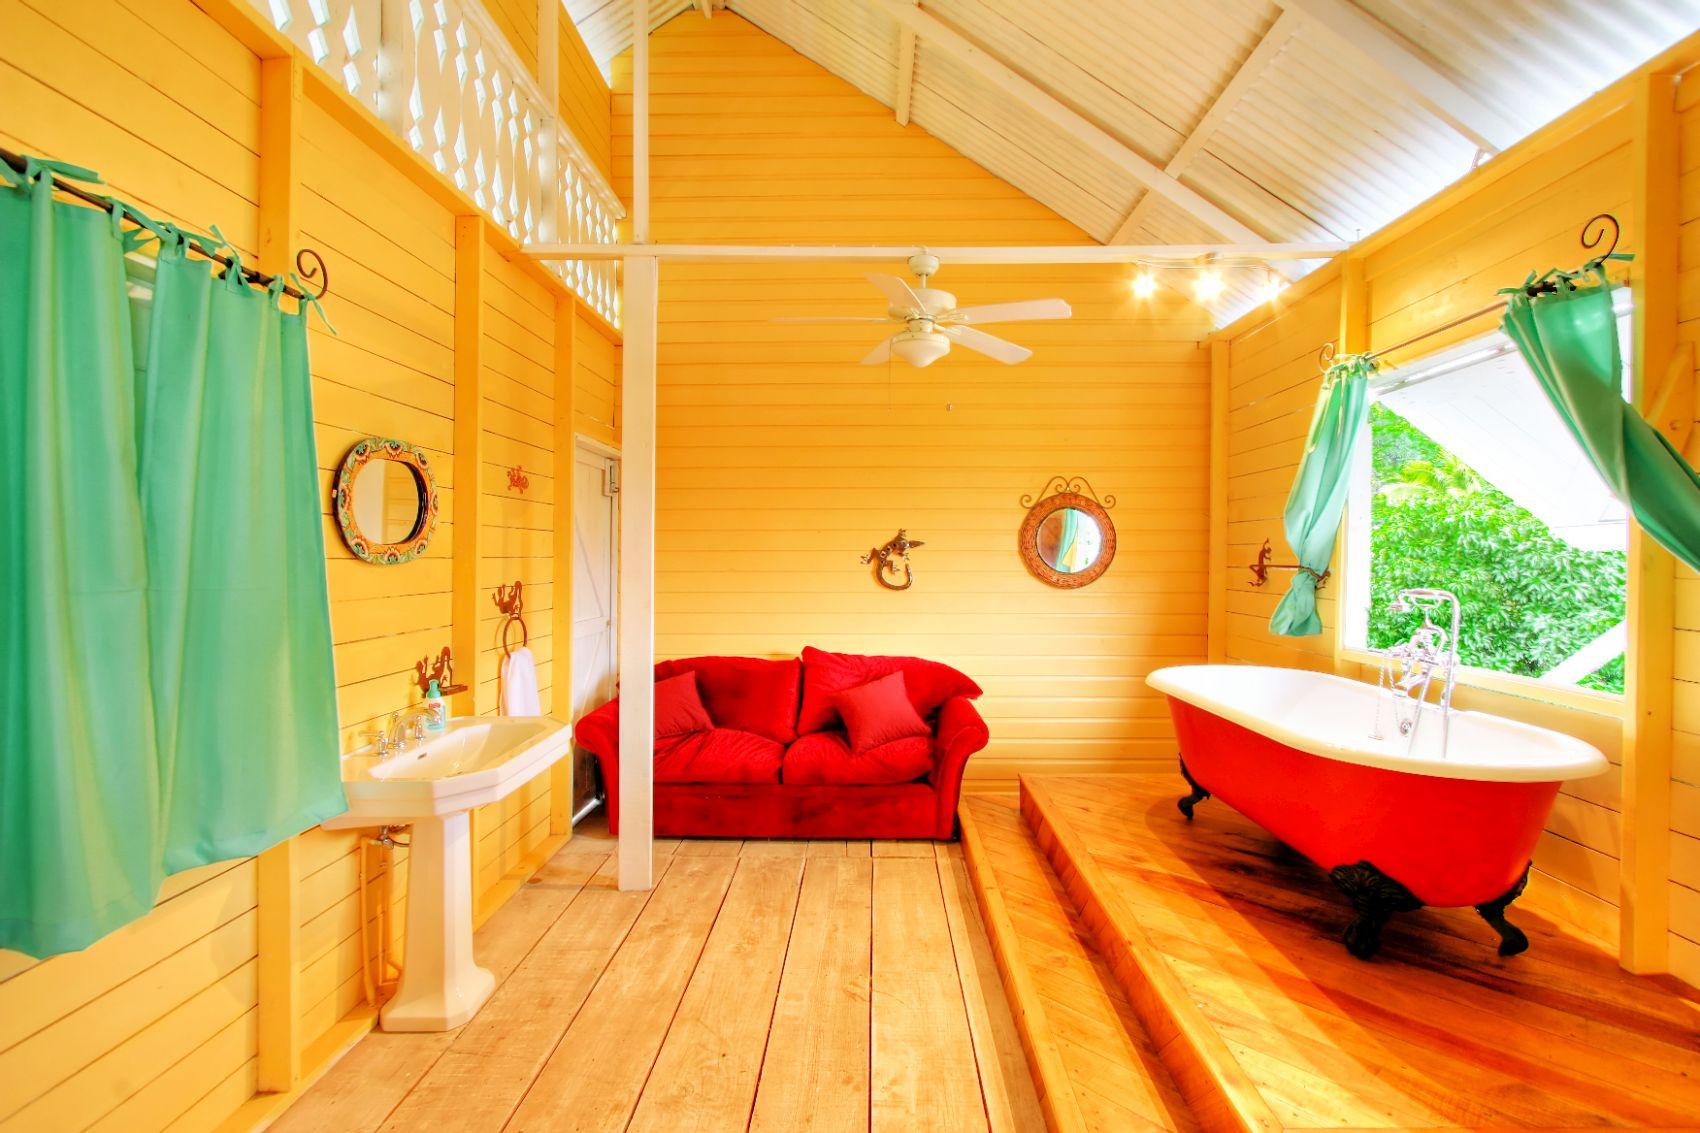 Mount Edgecombe bathroom.jpg